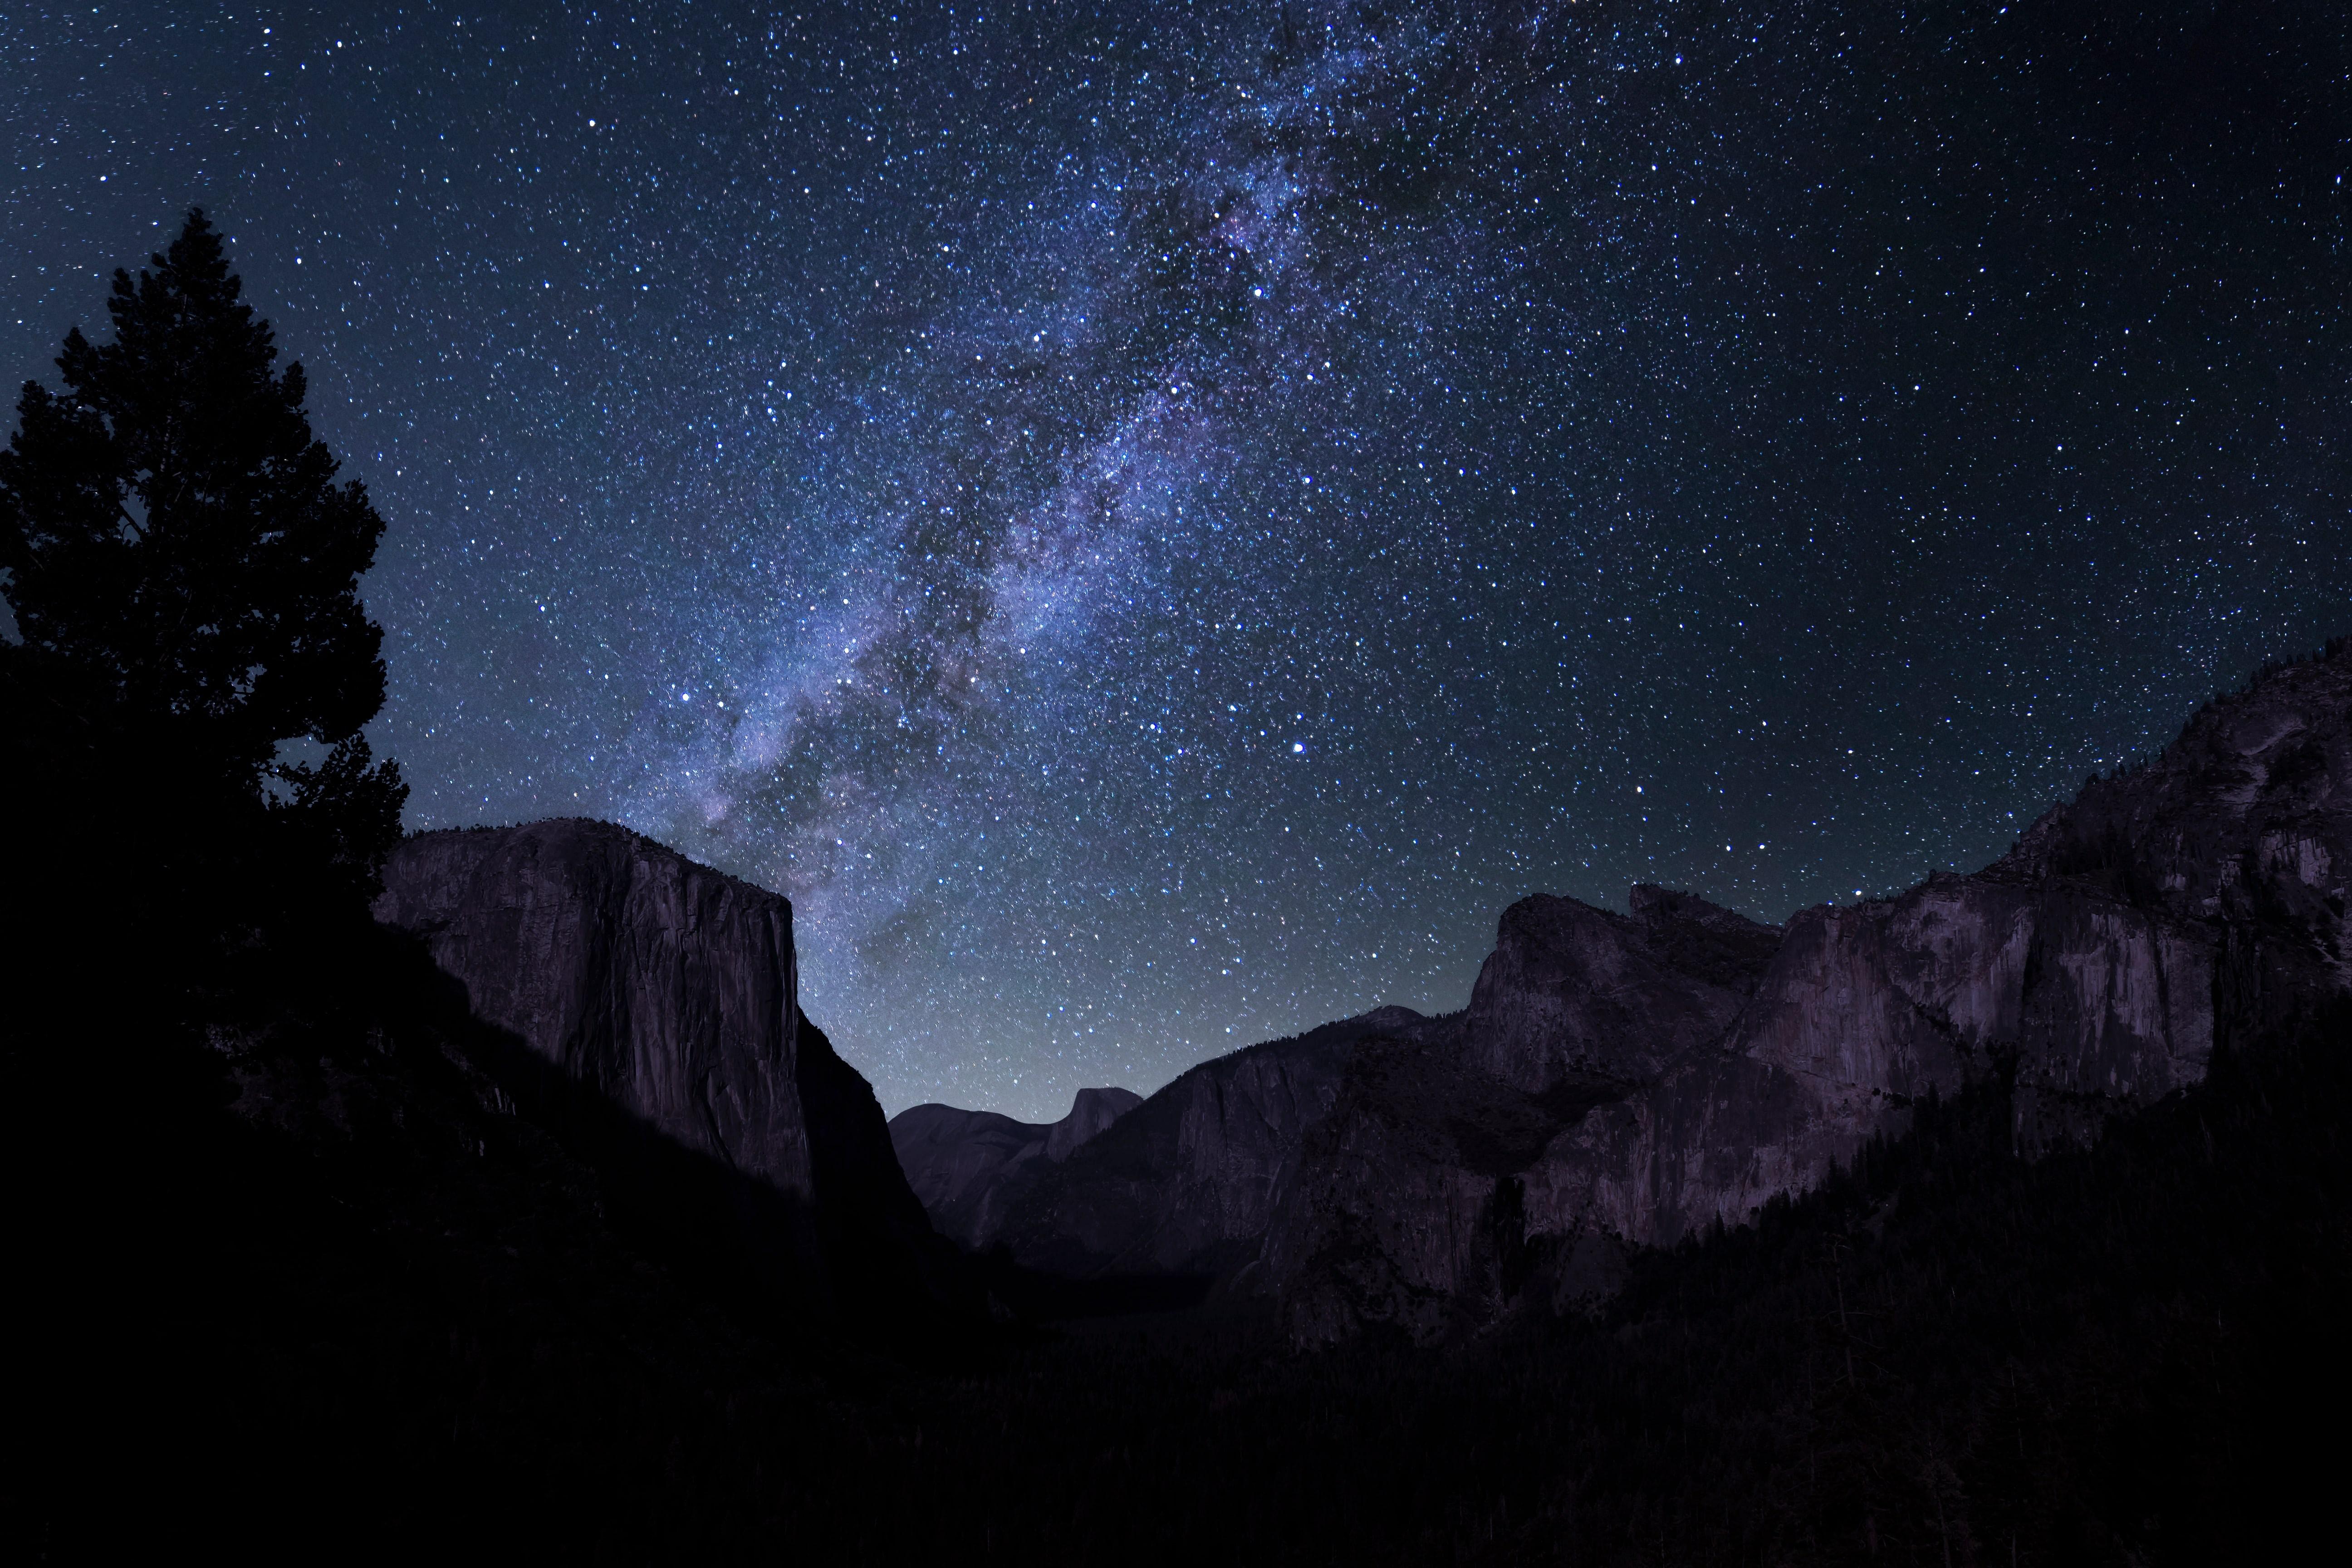 constellation above mountain